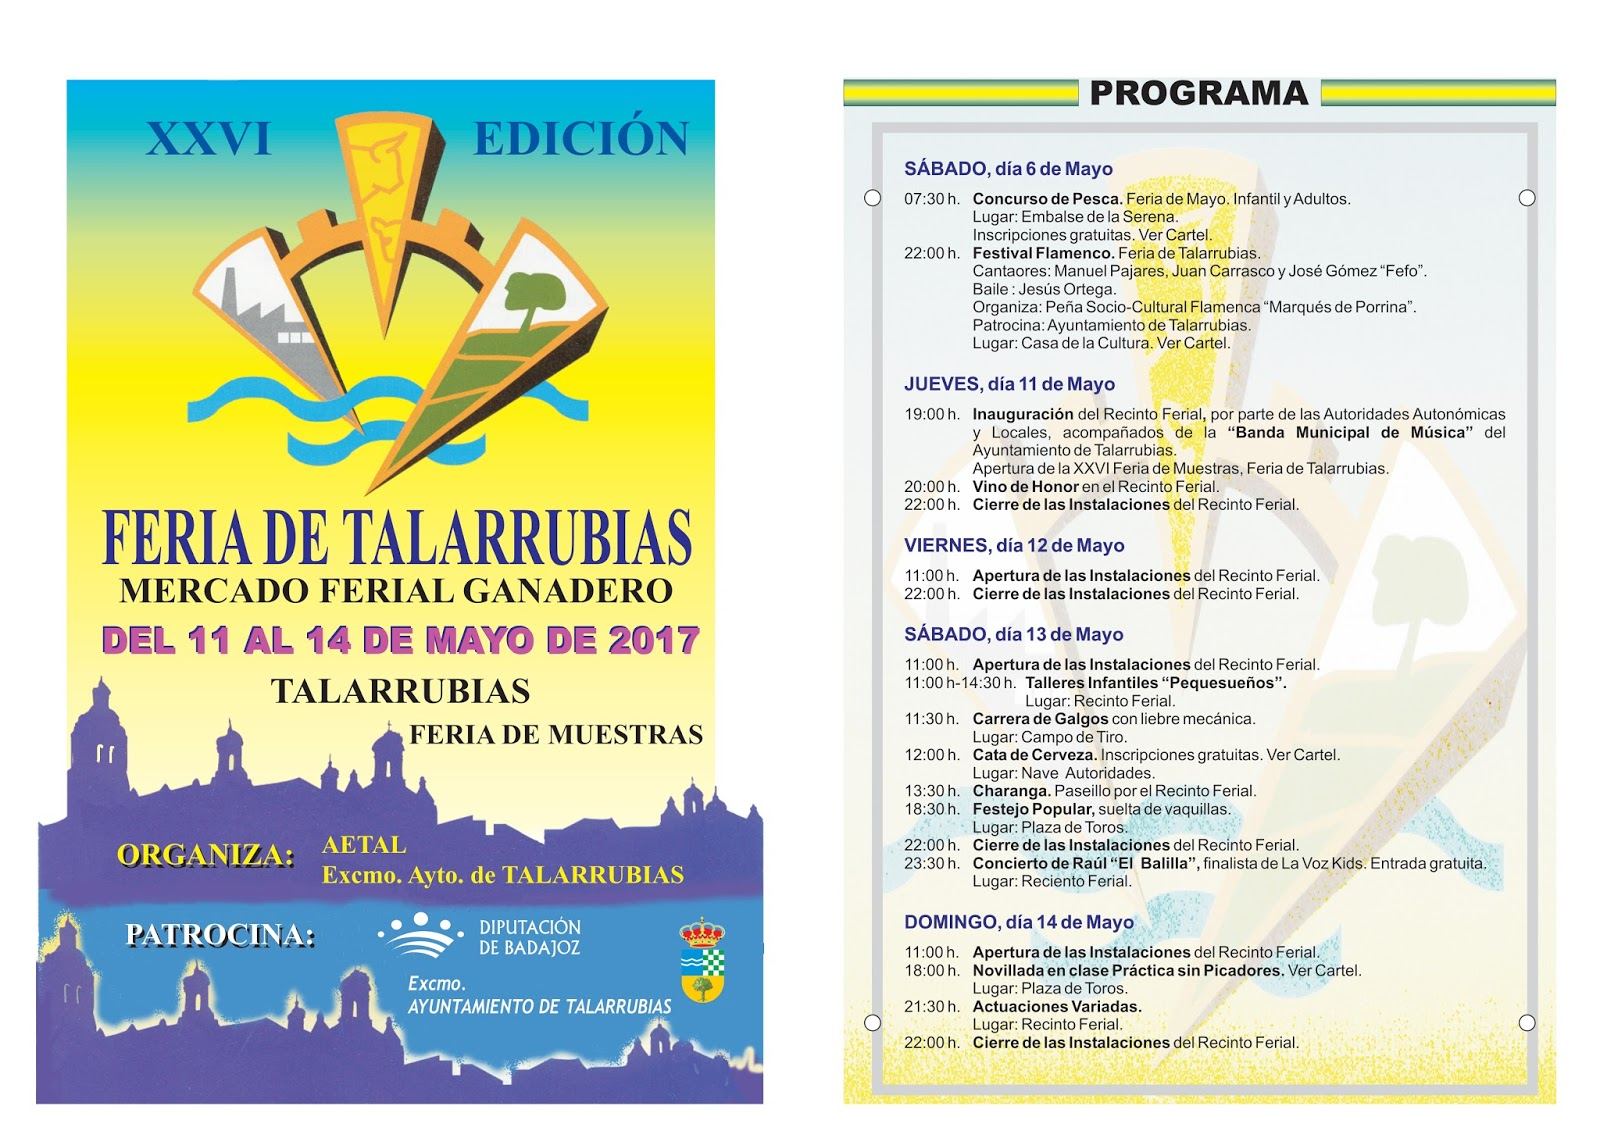 XXVI Feria de muestras - Talarrubias